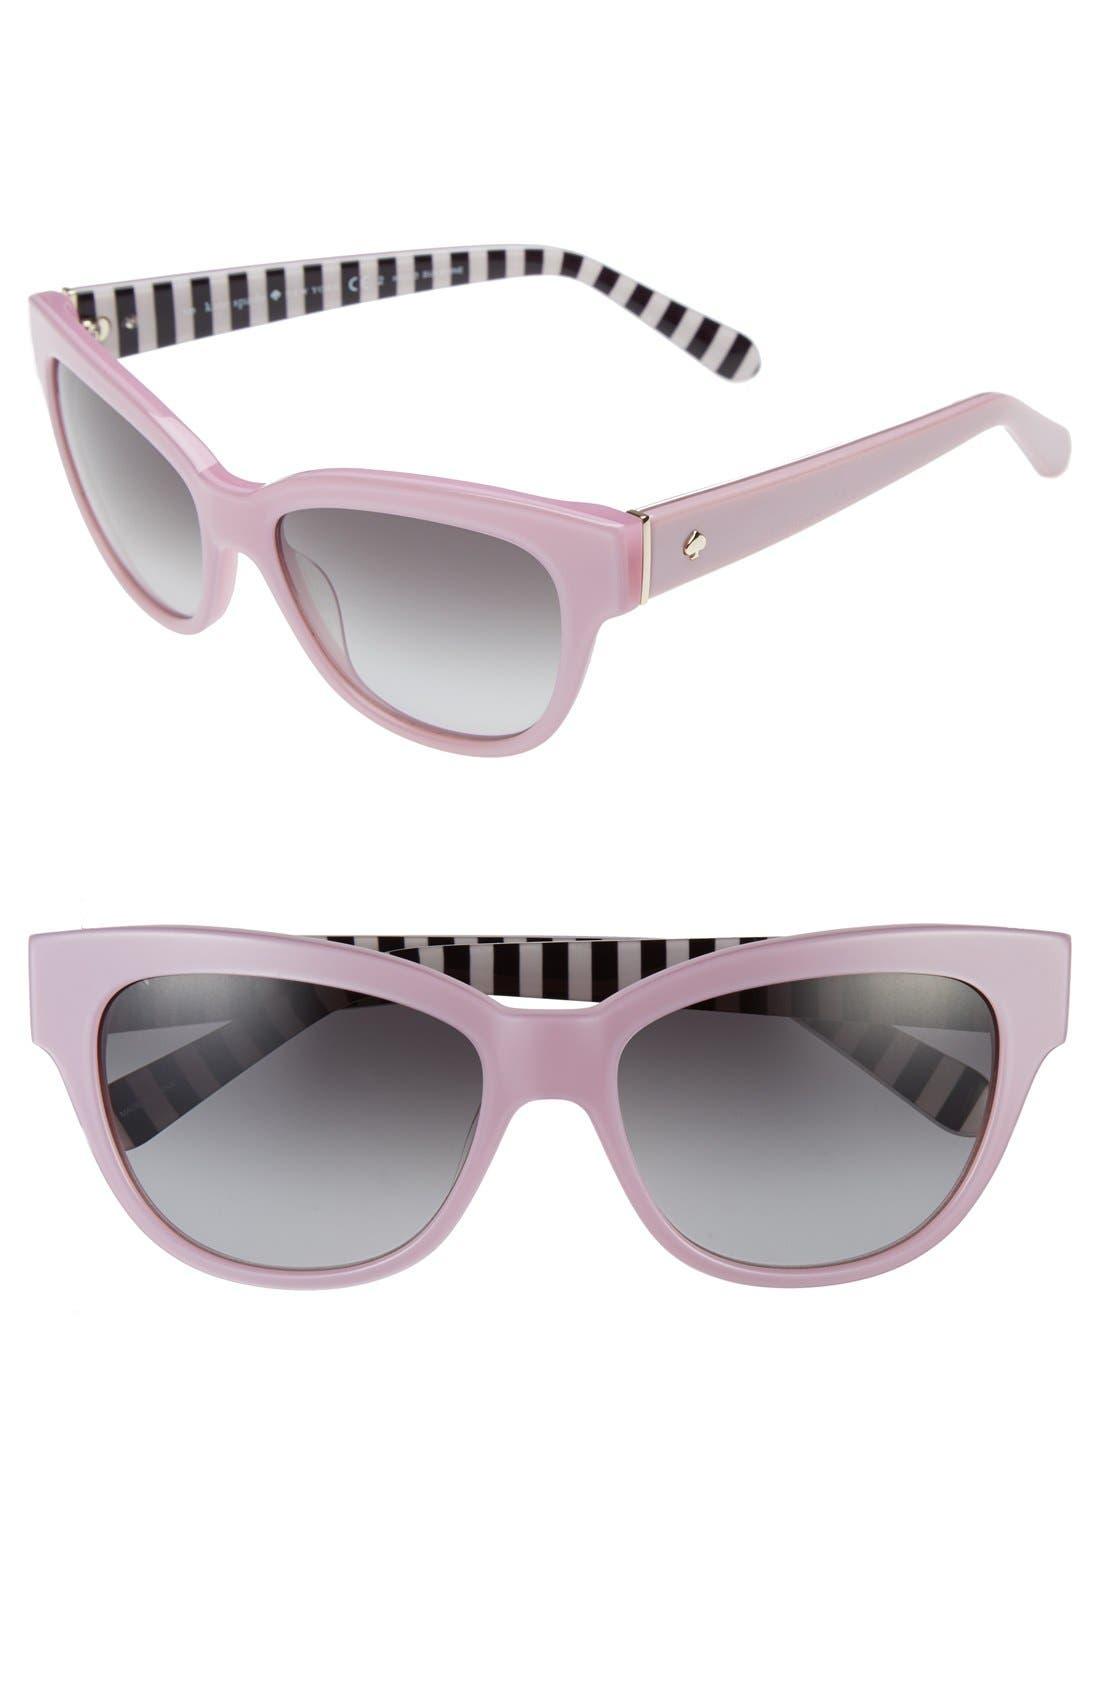 Main Image - kate spade new york 'aisha' 54mm cat eye sunglasses